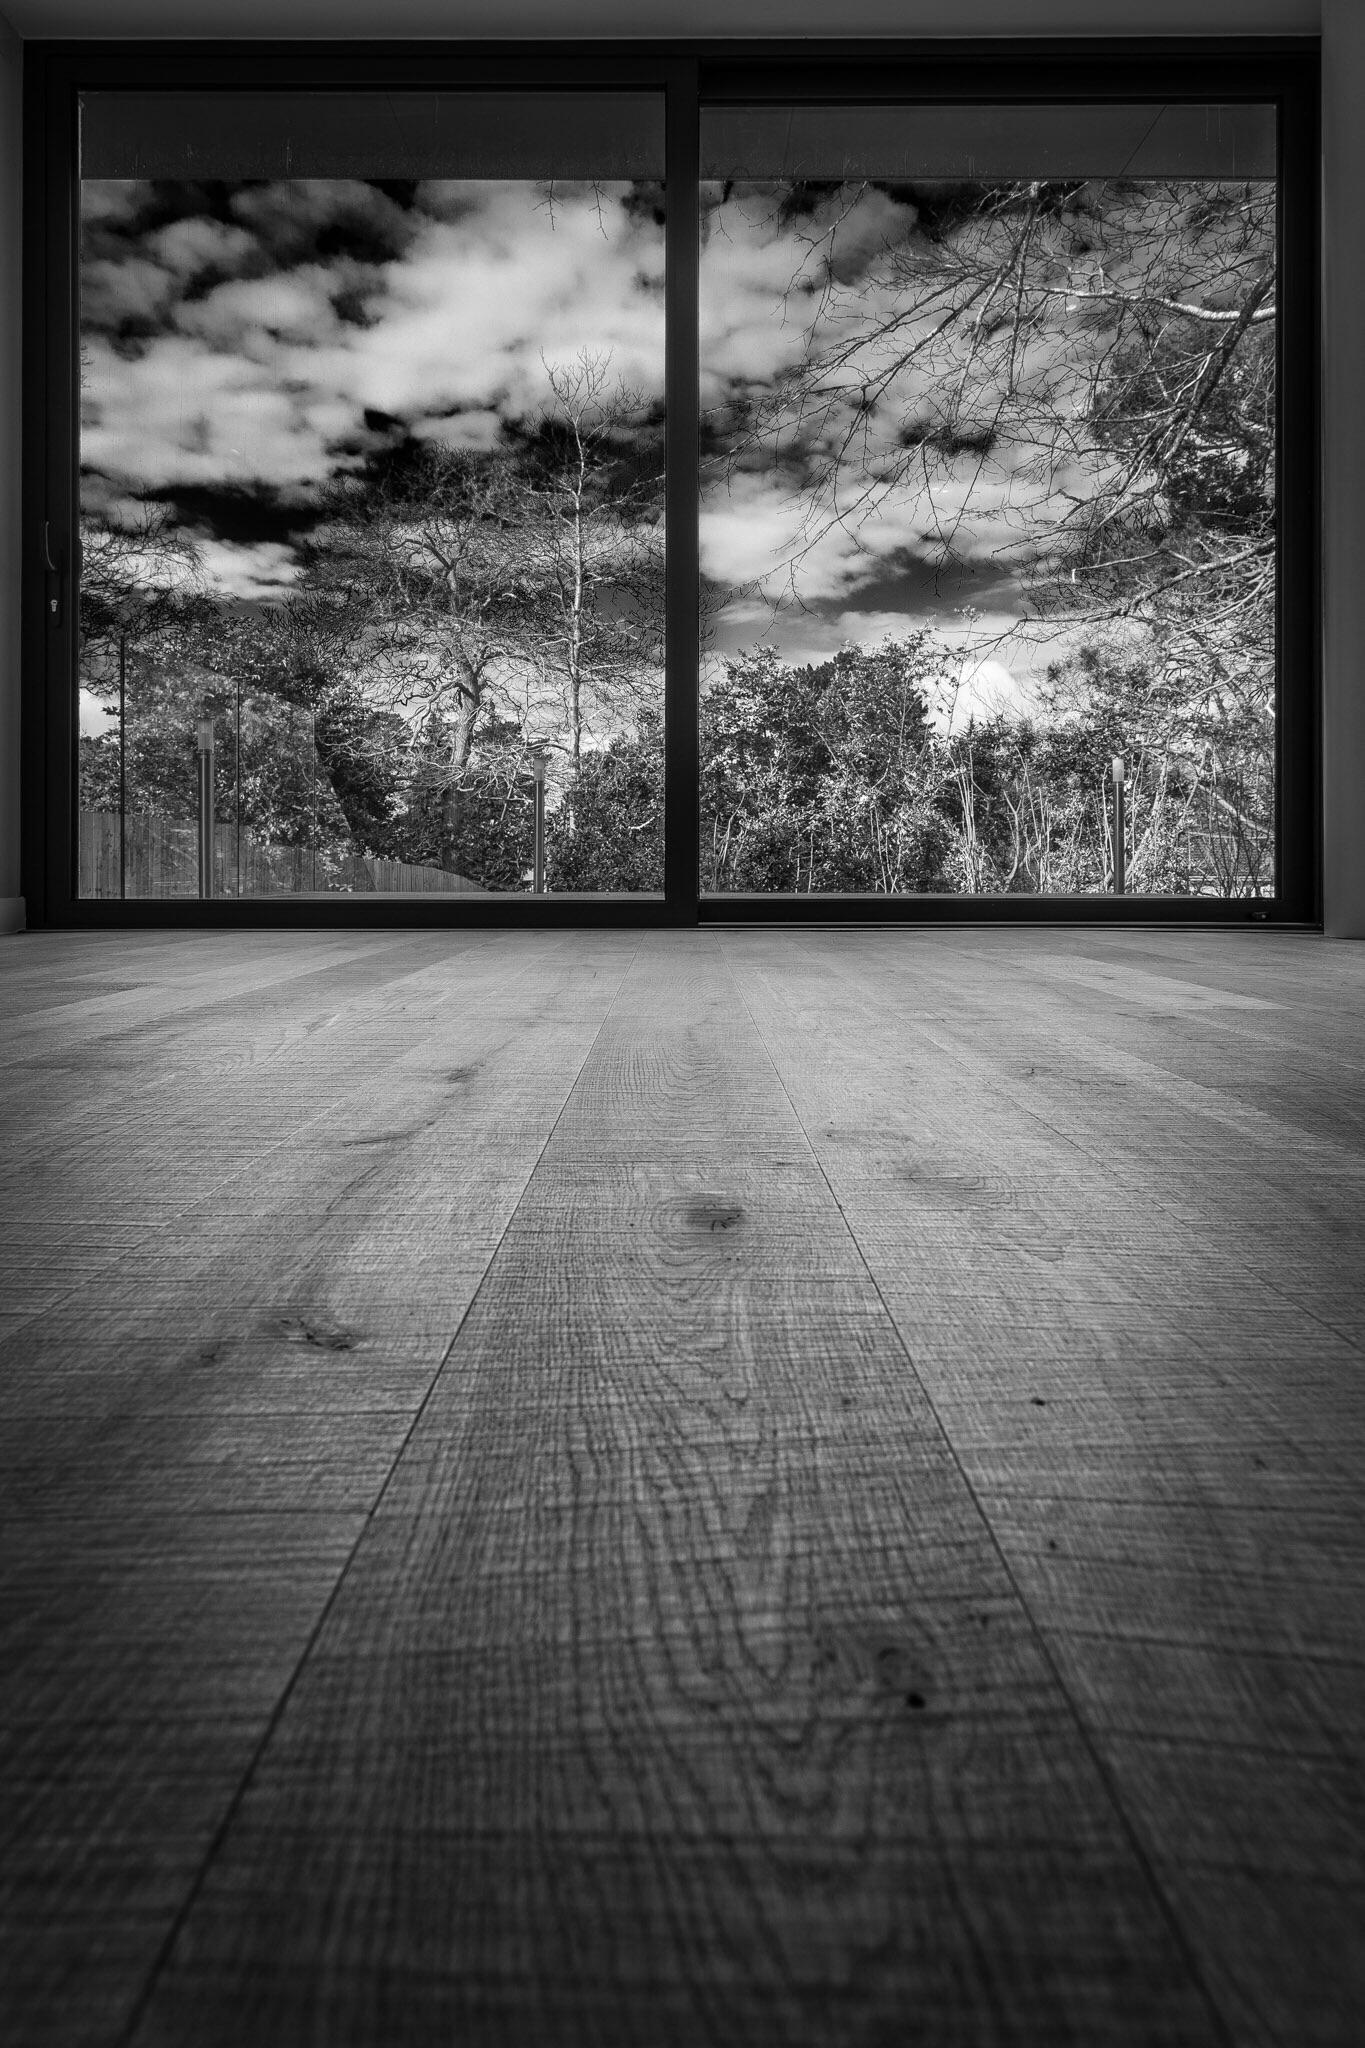 House, Poole, Dorset - interior photography by Rick McEvoy